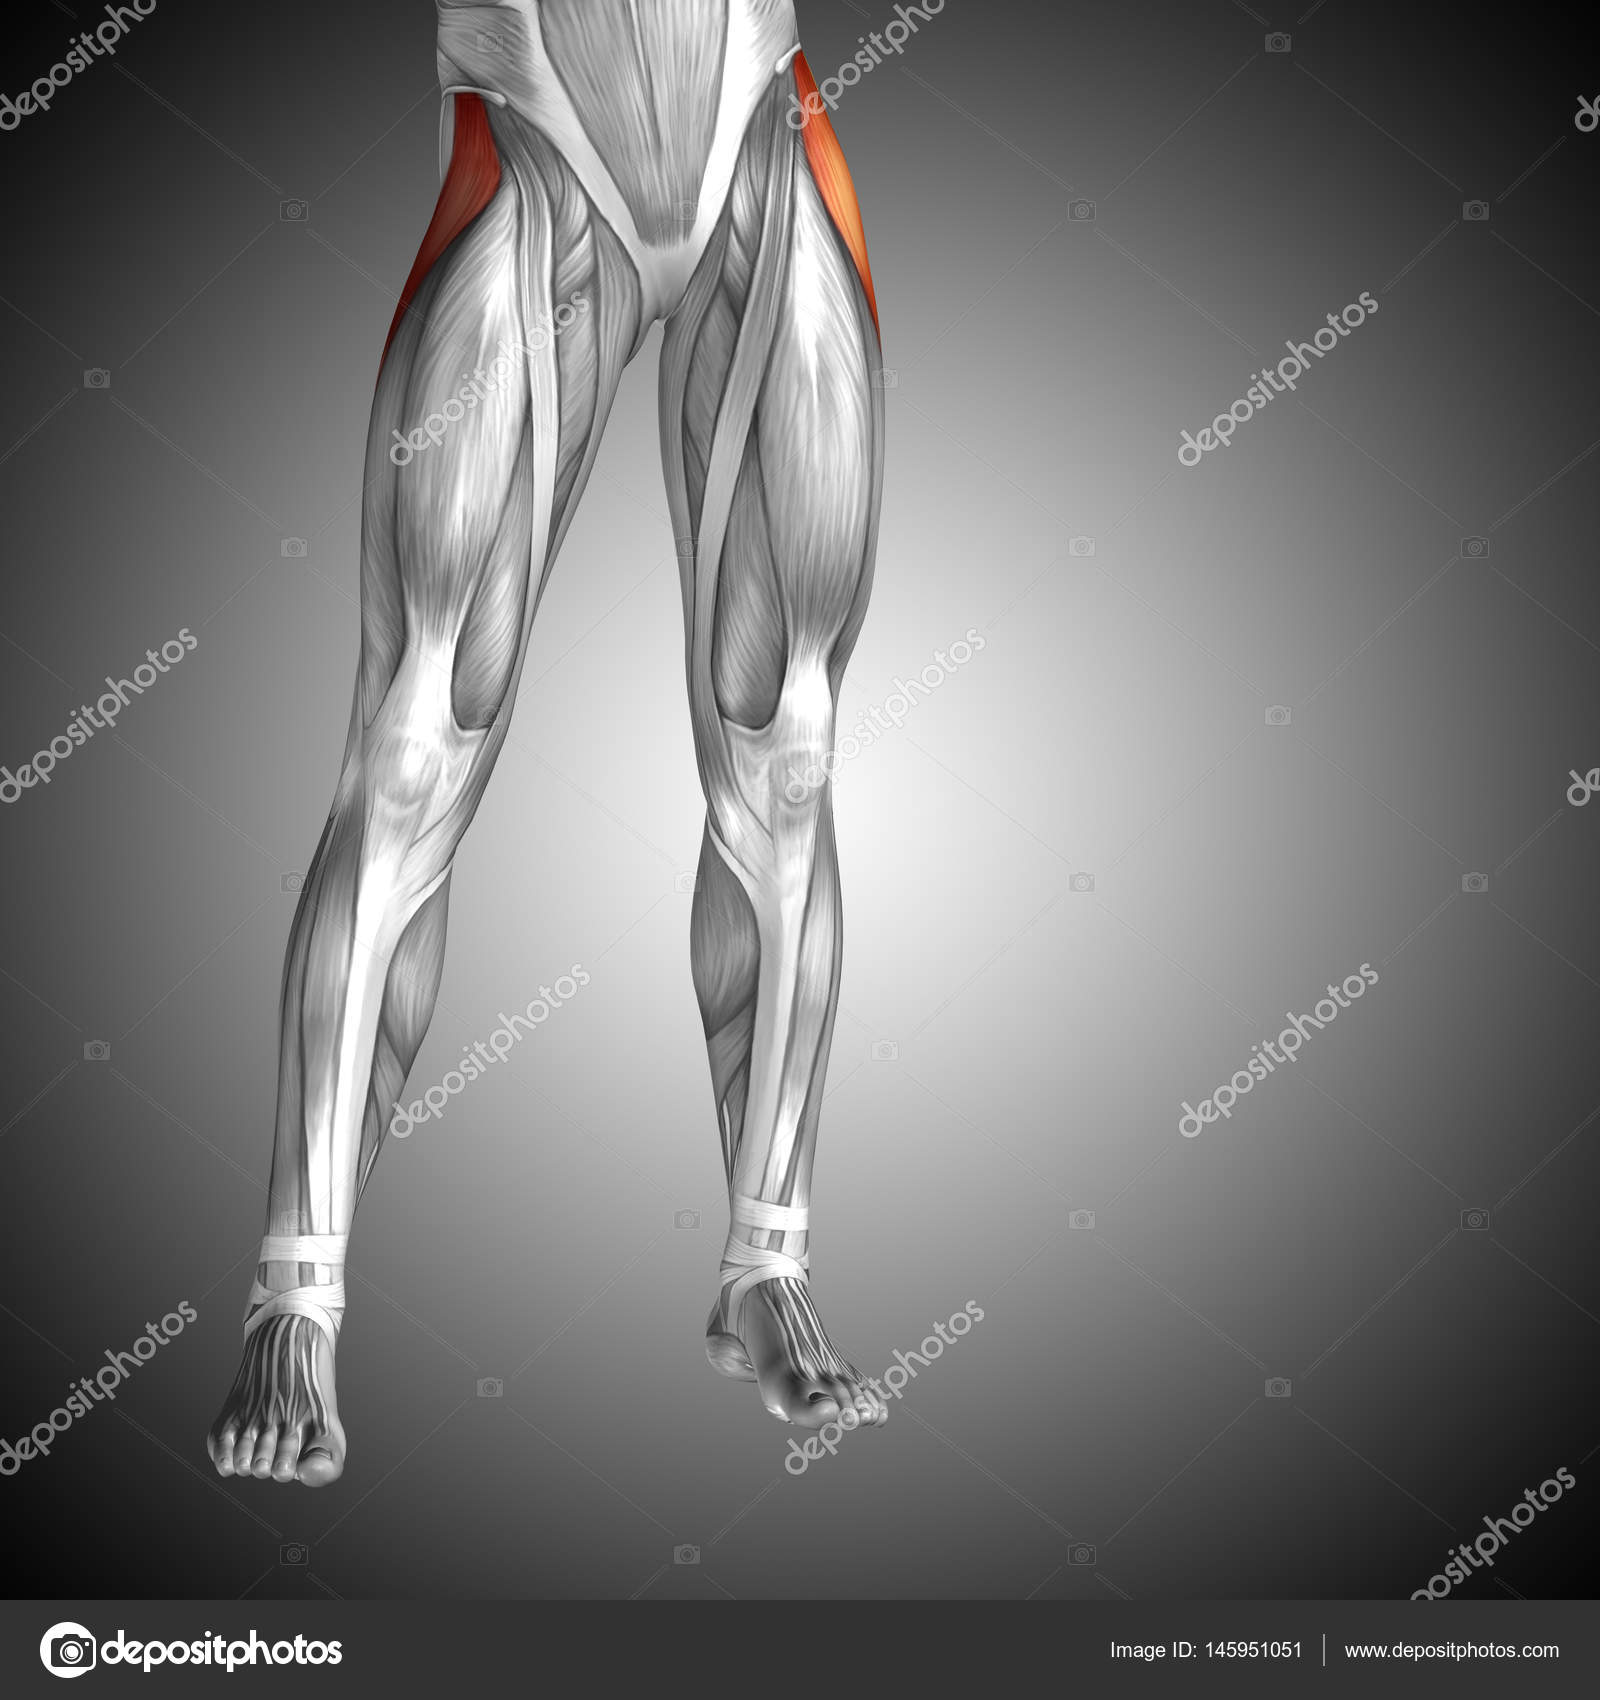 Concepto anatómico 3d ilustración — Foto de stock © design36 #145951051